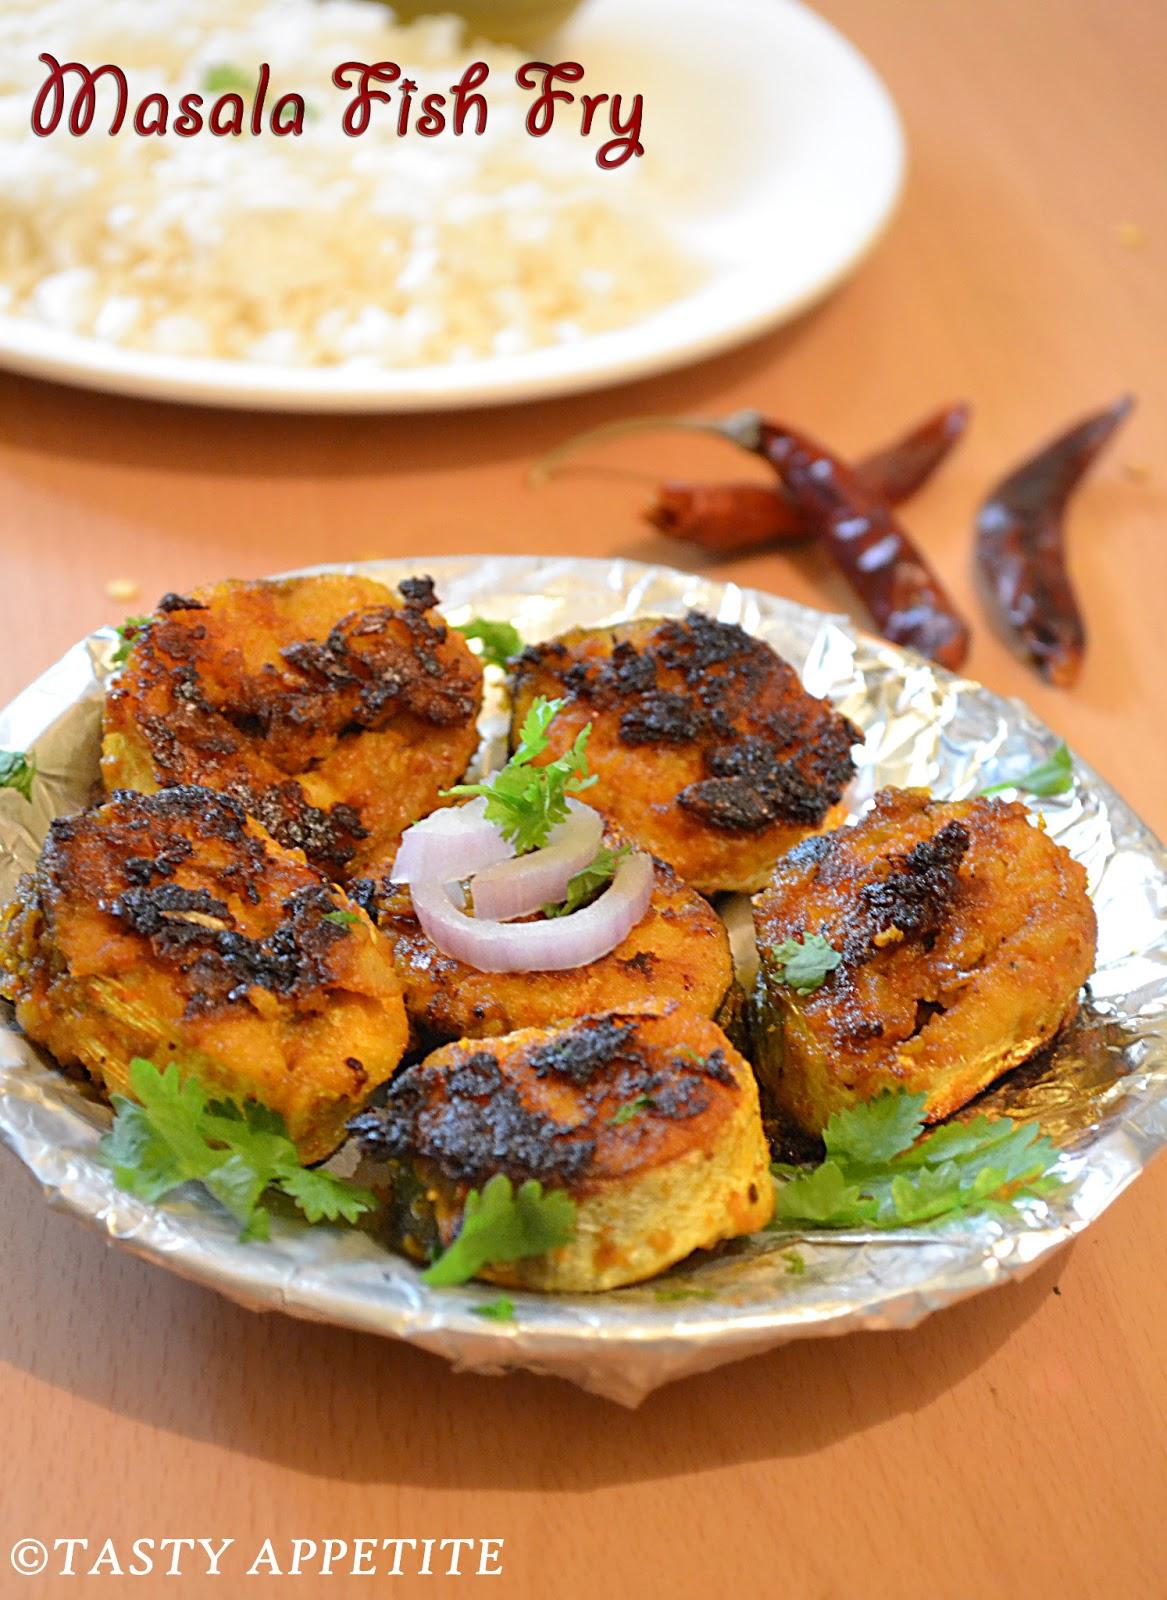 How To Make Masala Fish Fry / South Indian Fish Fry Recipe